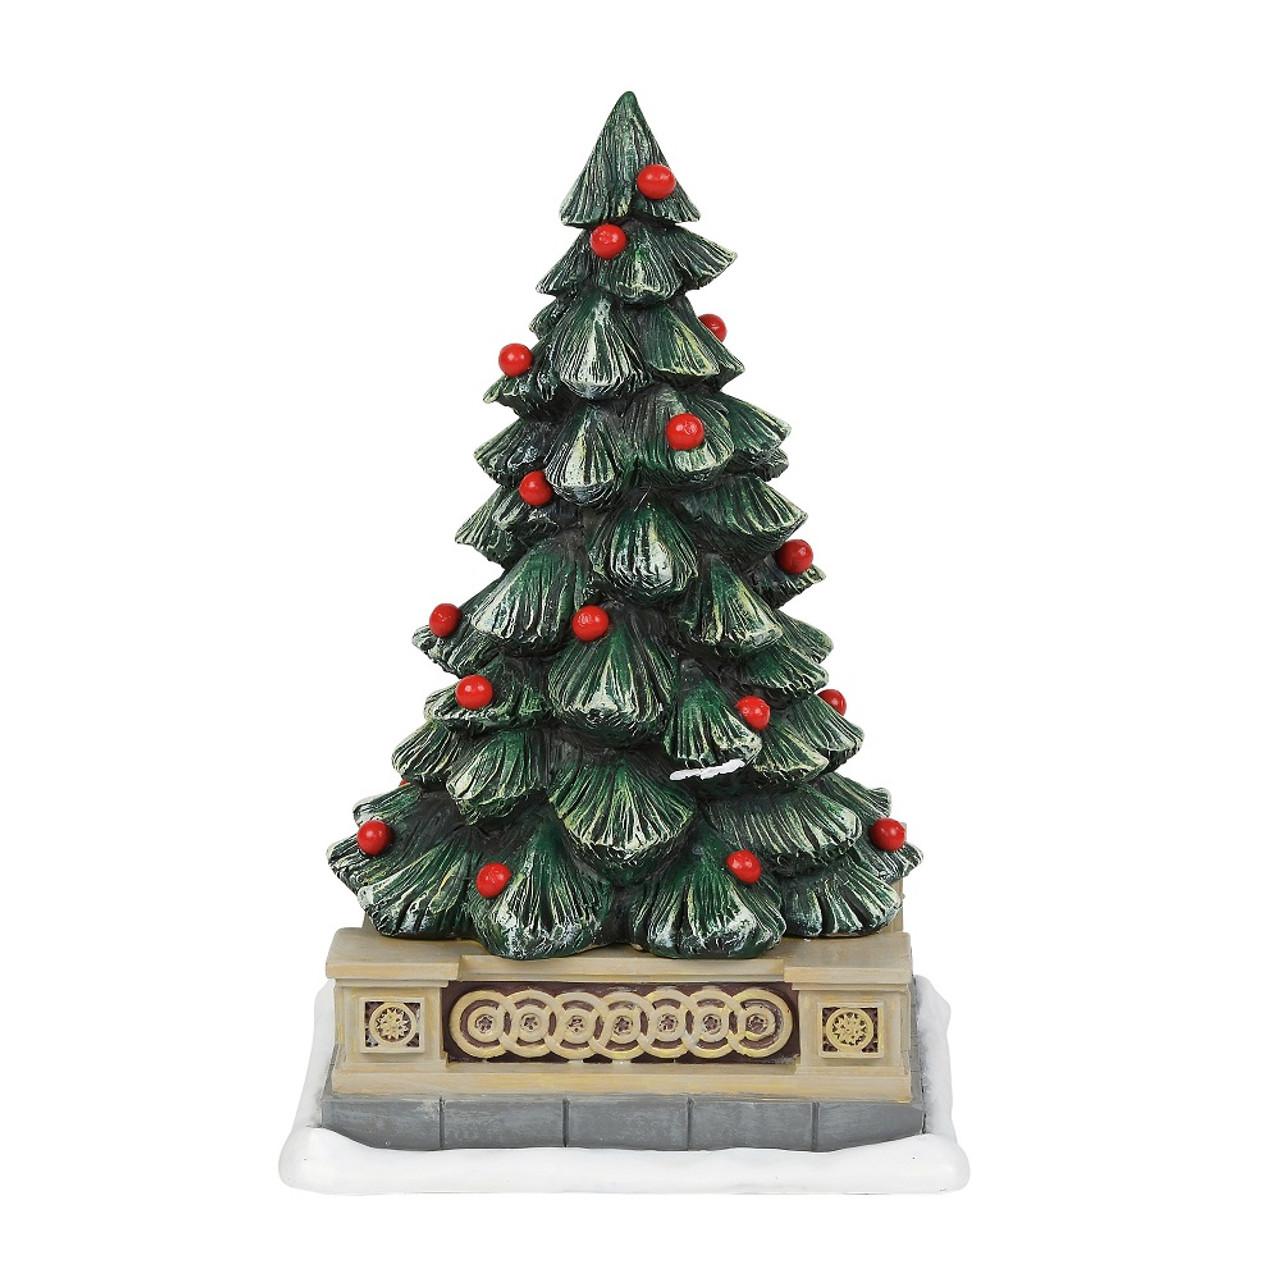 Christmas Village Accessories.Department 56 General Village Accessory Classic Christmas Holiday Tree2018